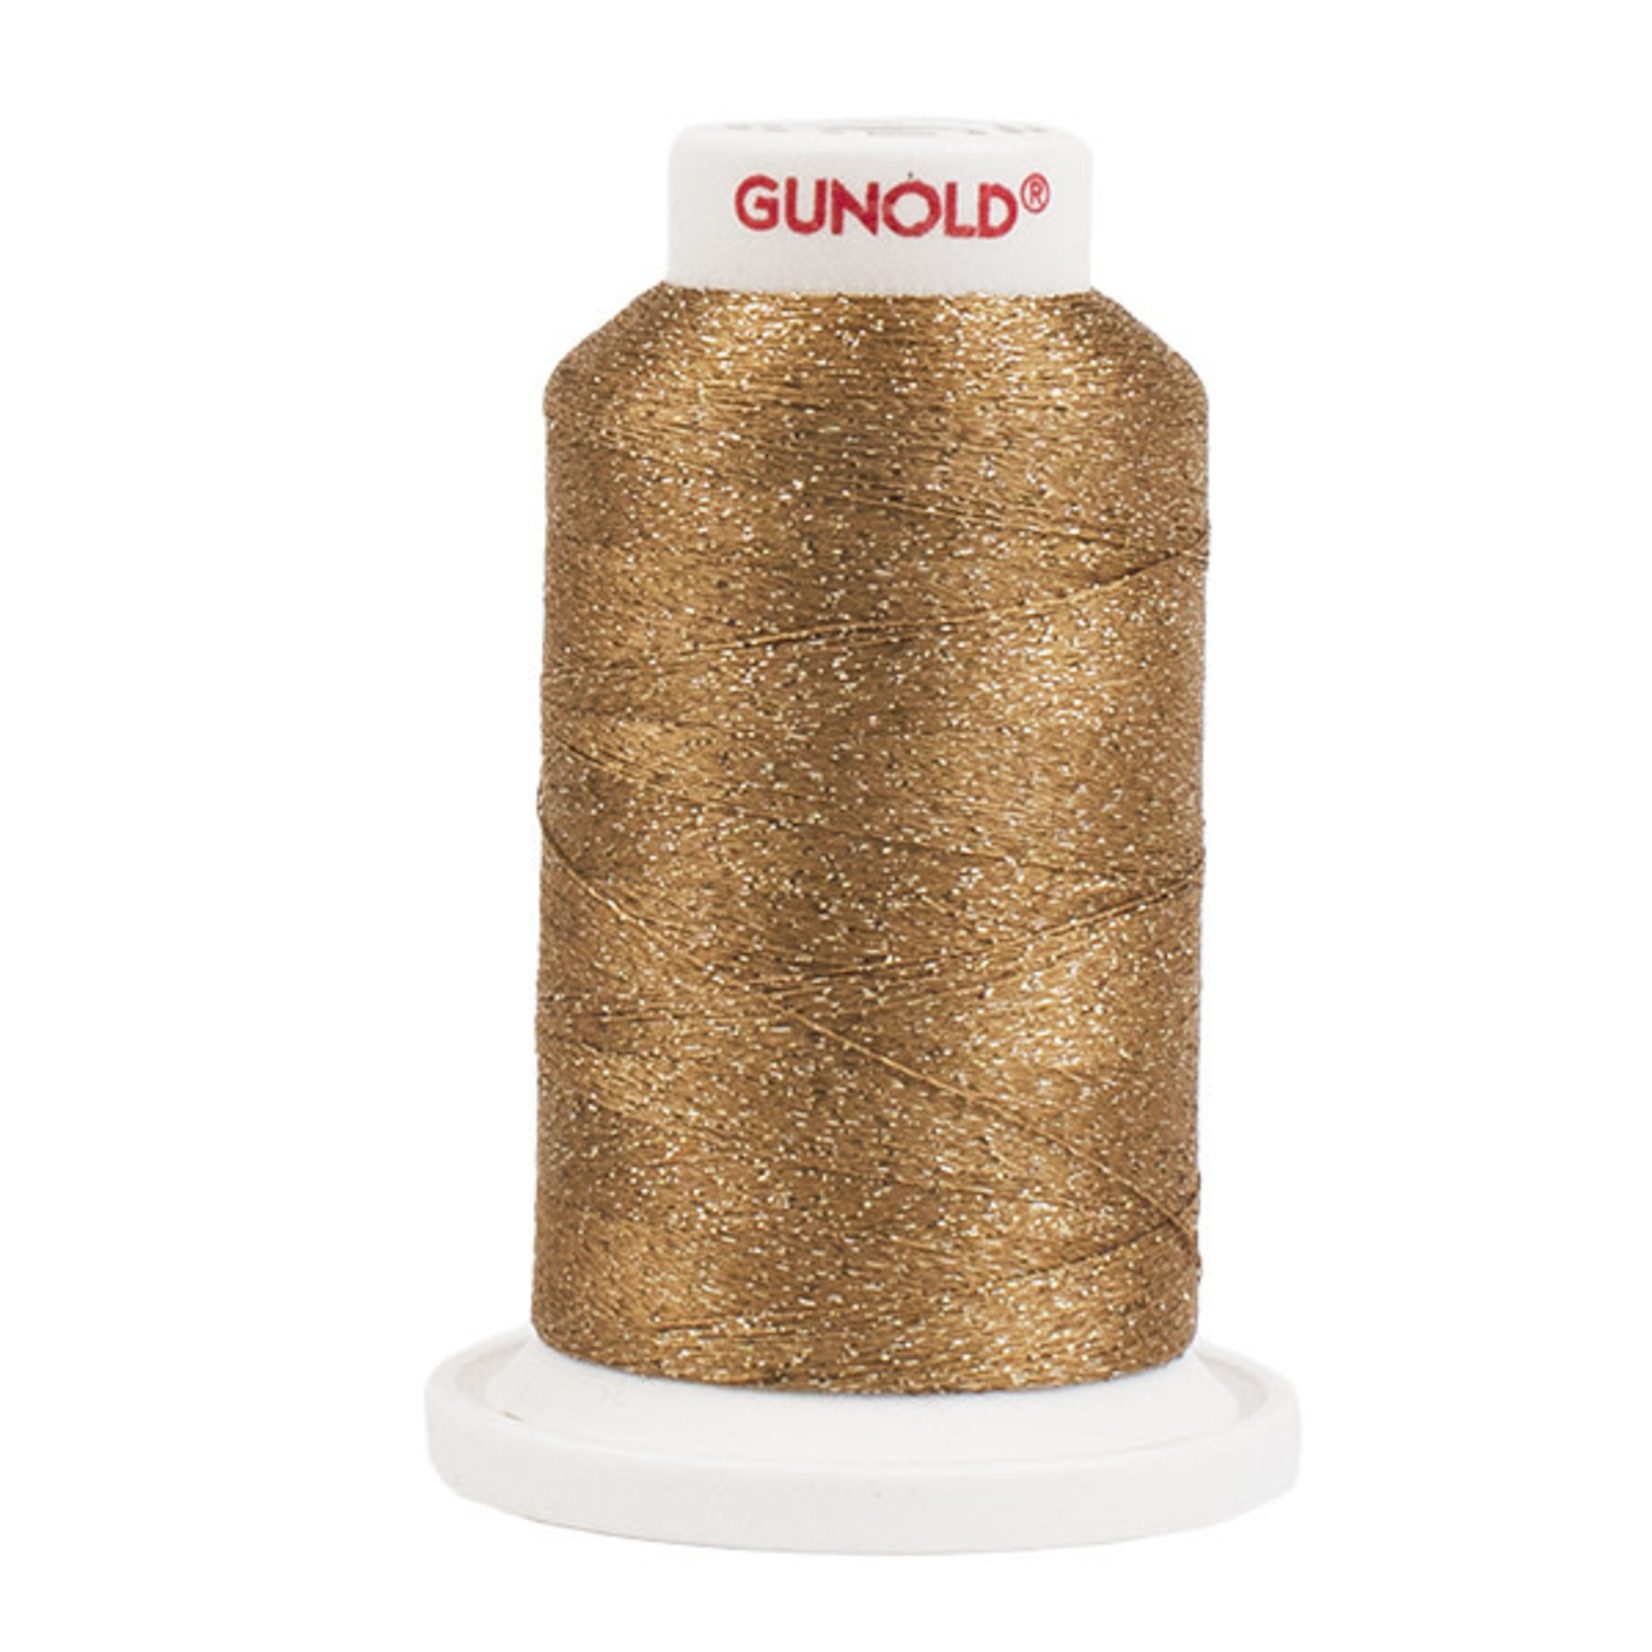 Gunold Poly Sparkle™ (Star™) Mini-King Cone 1,100 YD, 30 Wt, Medium Tawny Tan with Tone On Tone Sparkle 50578